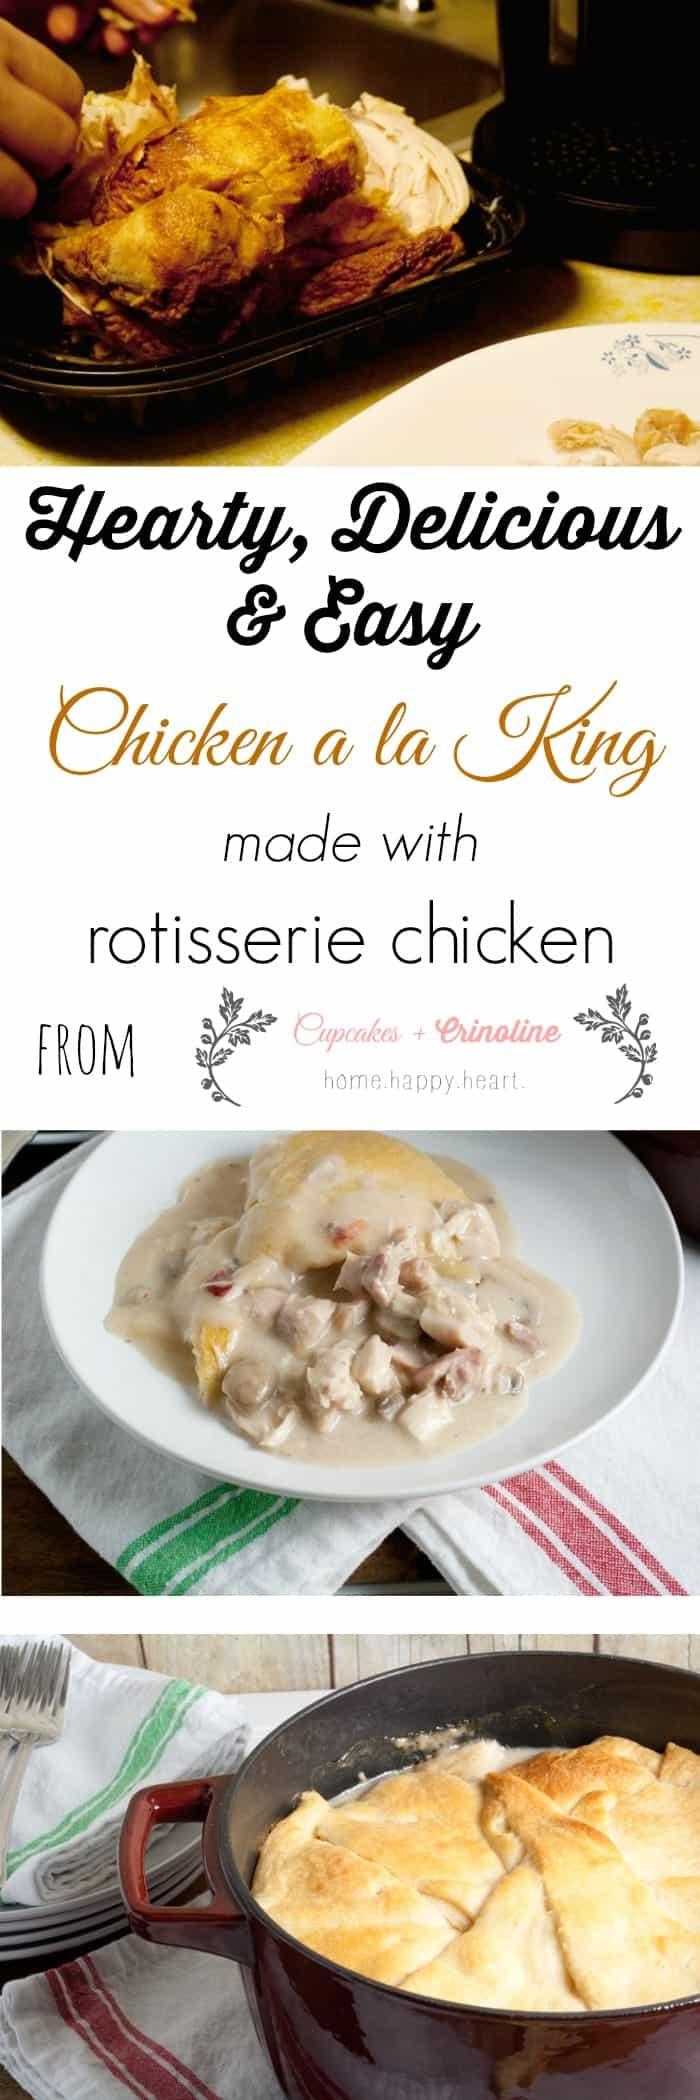 Chicken a la King from cupcakesandcrinoline.com